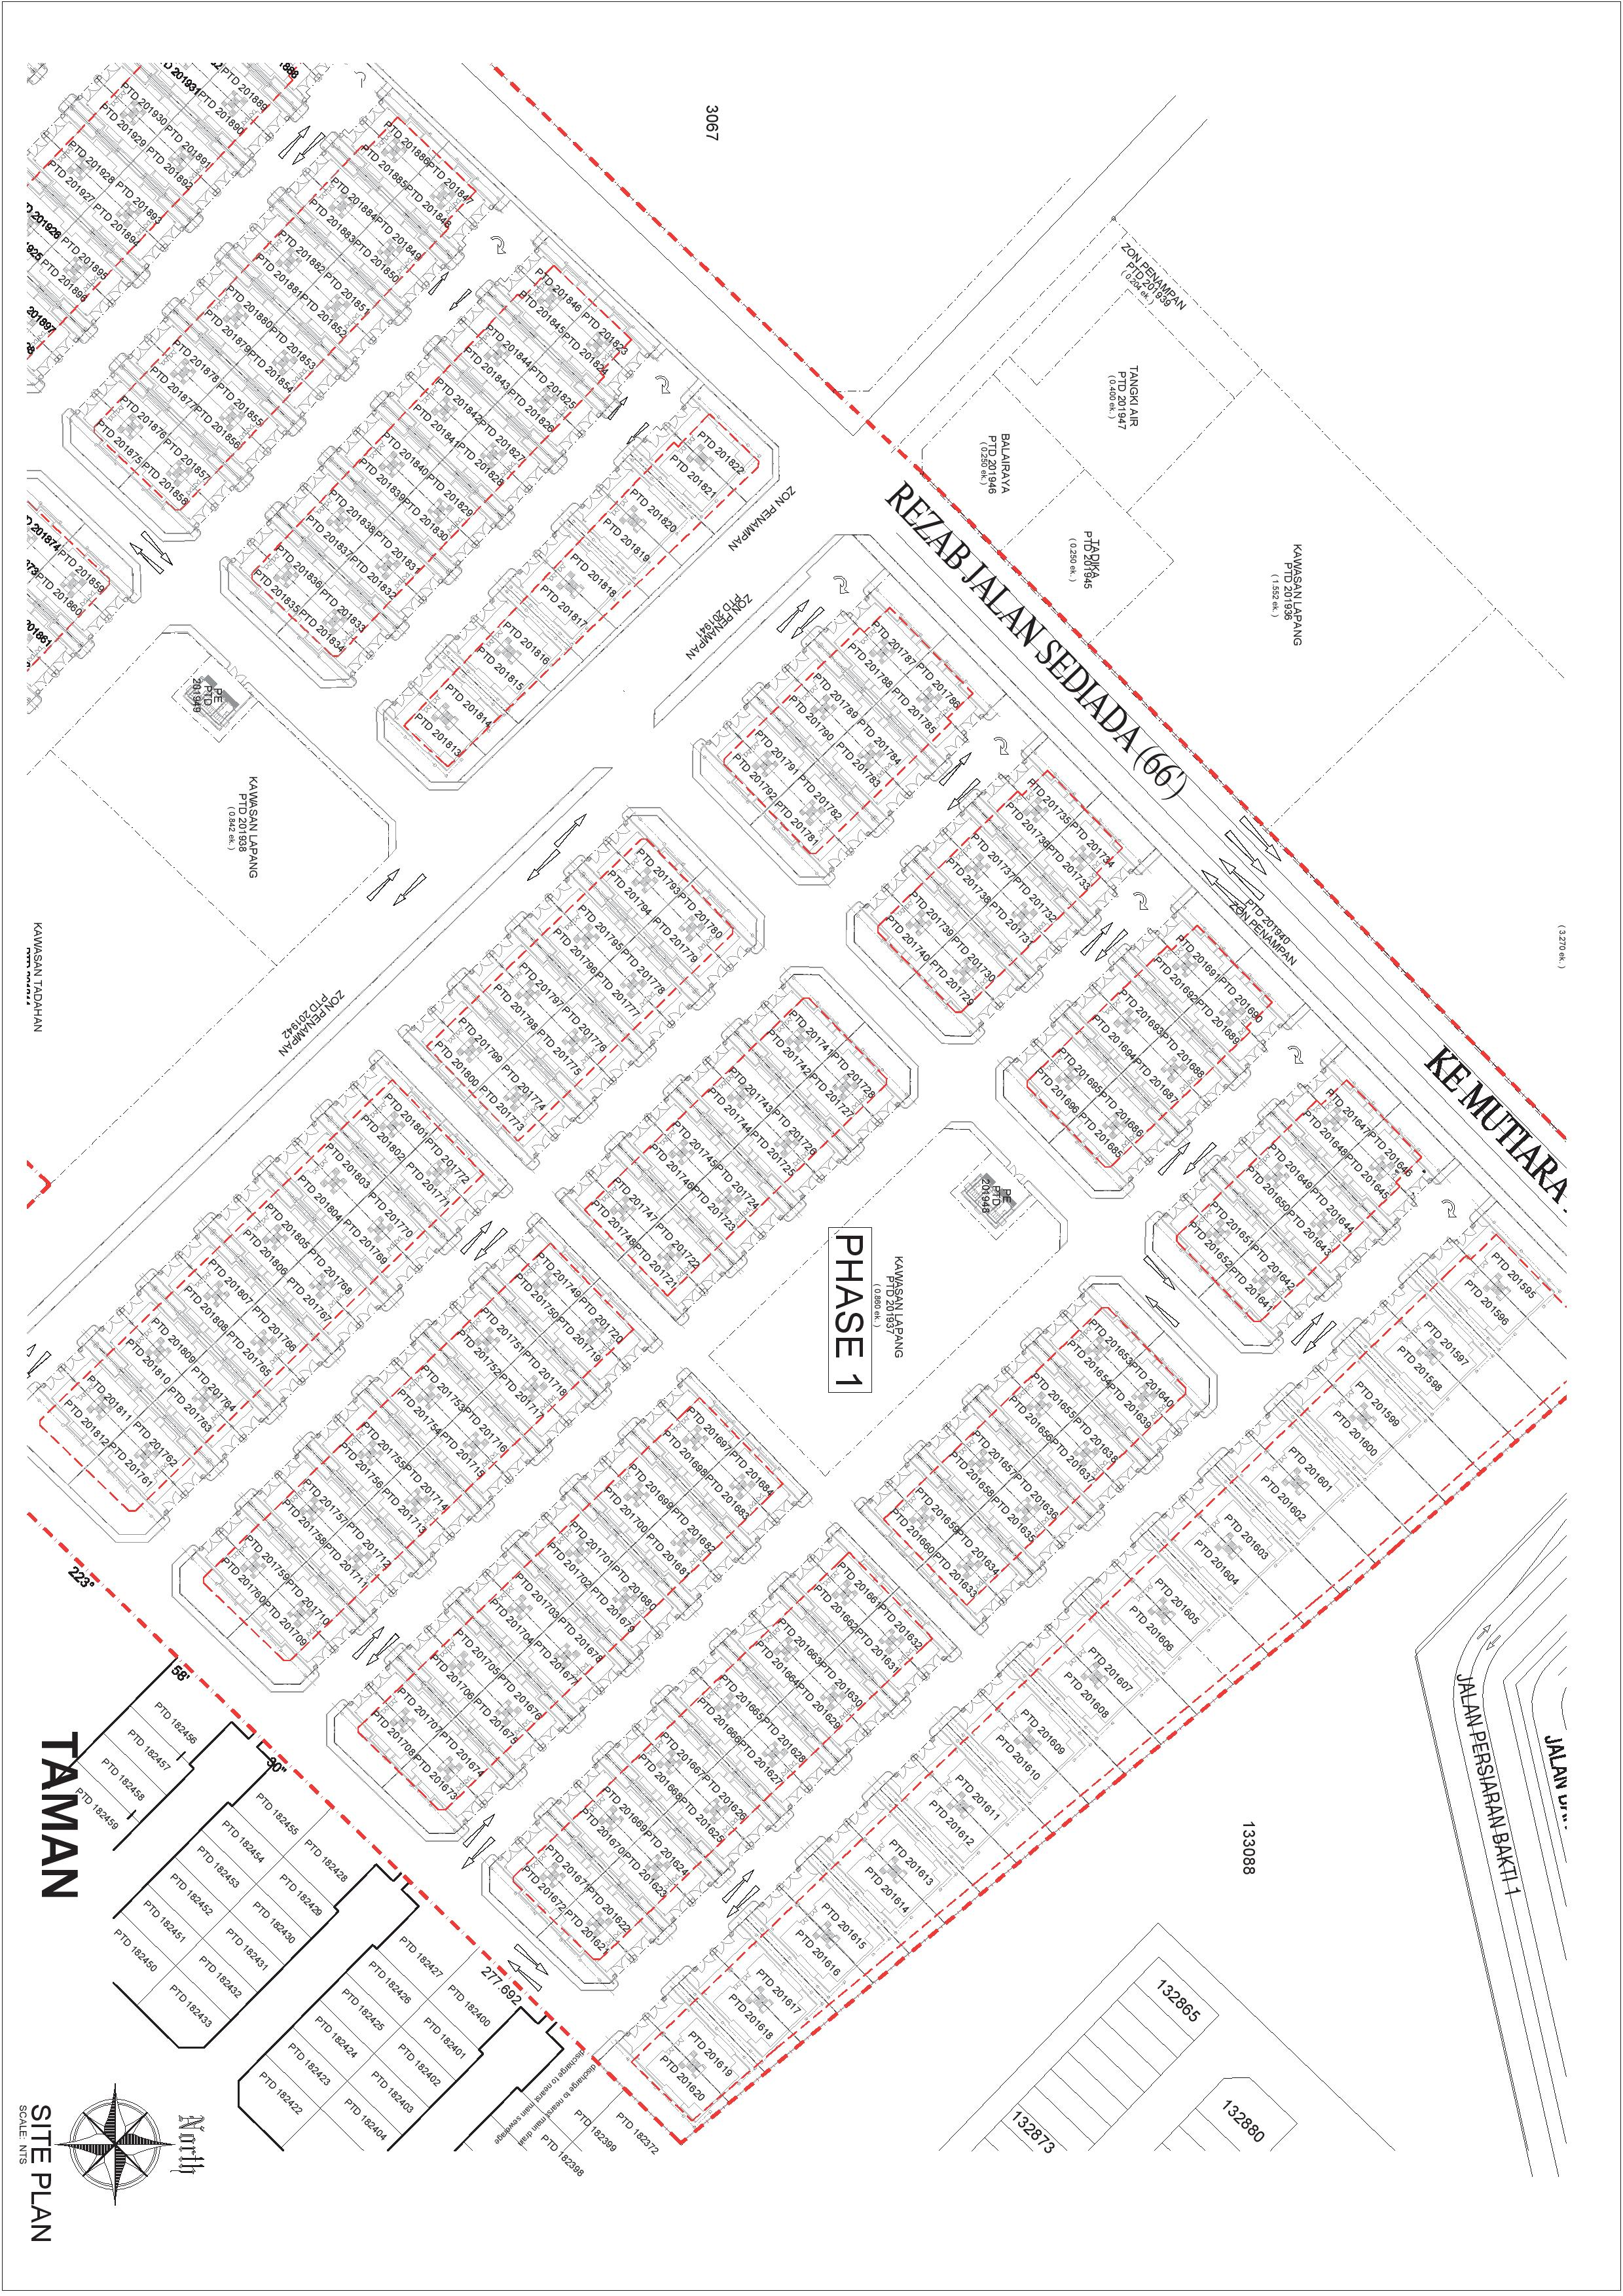 img/nusa-bestari/property-site-plan